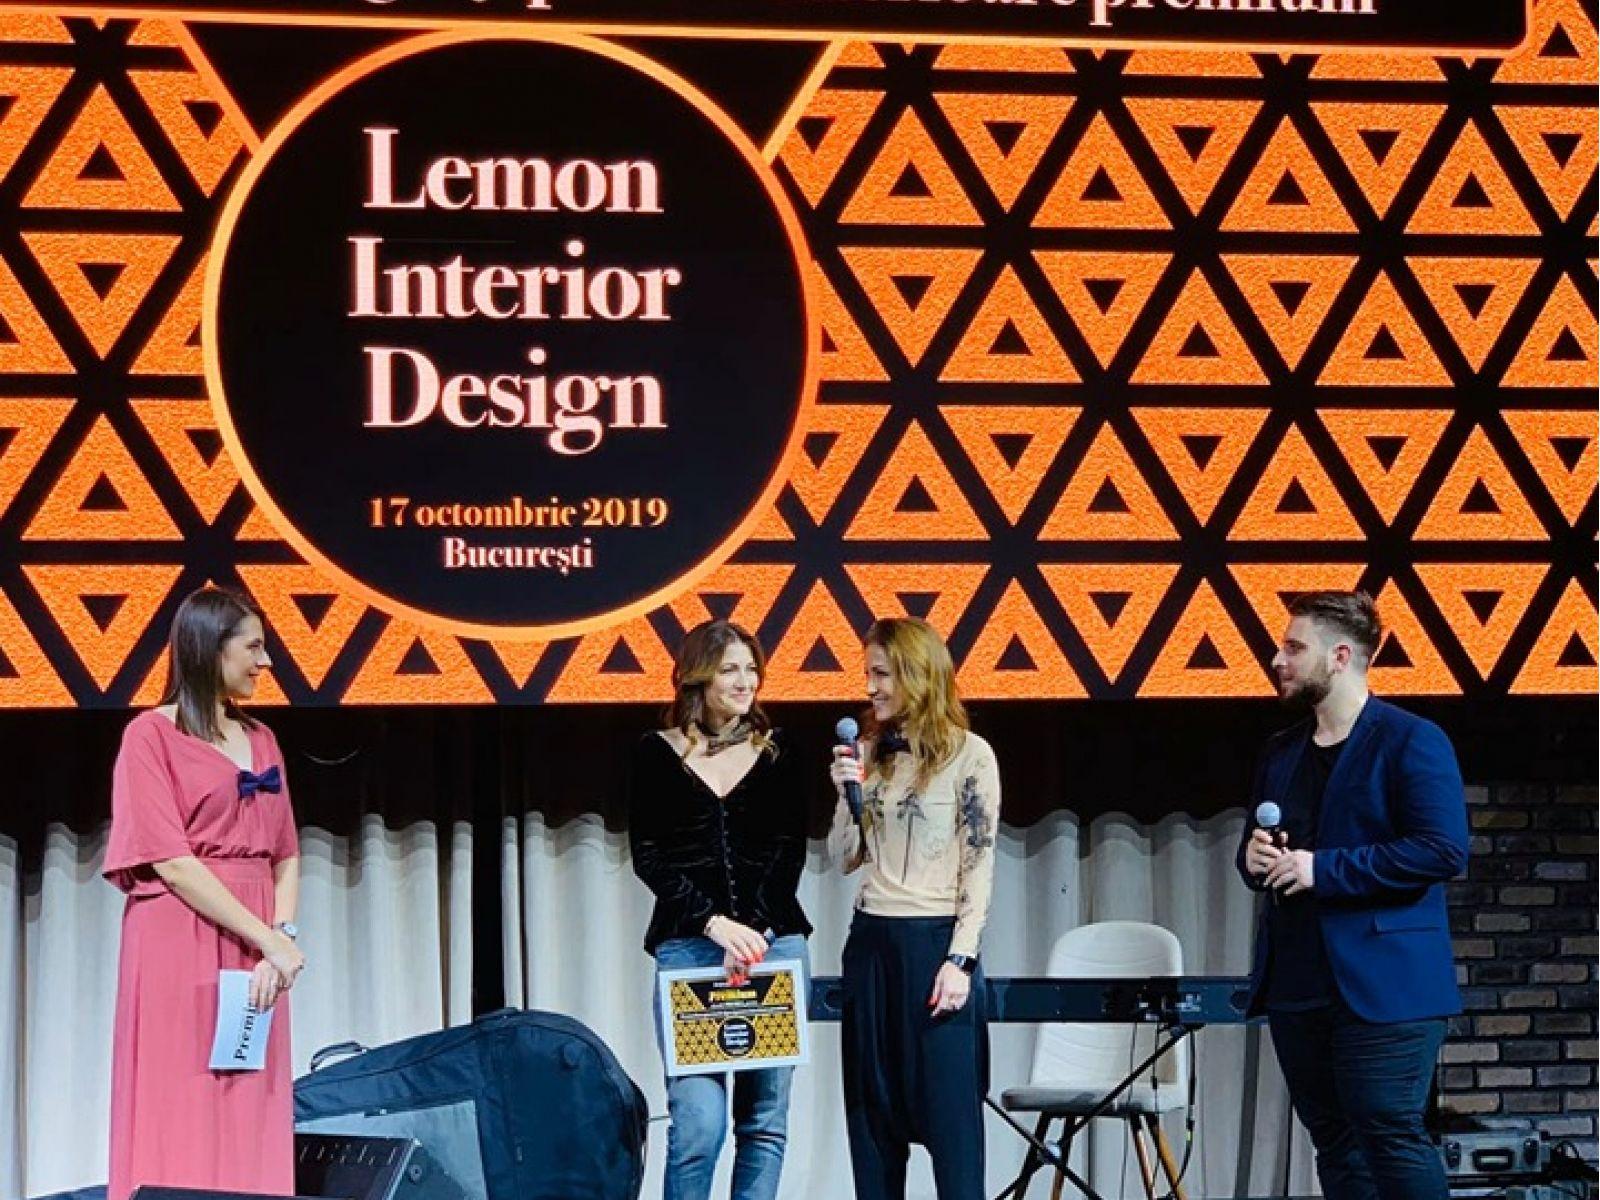 Lemon Interior Design was awarded at ZF După Afaceri Premium Gala